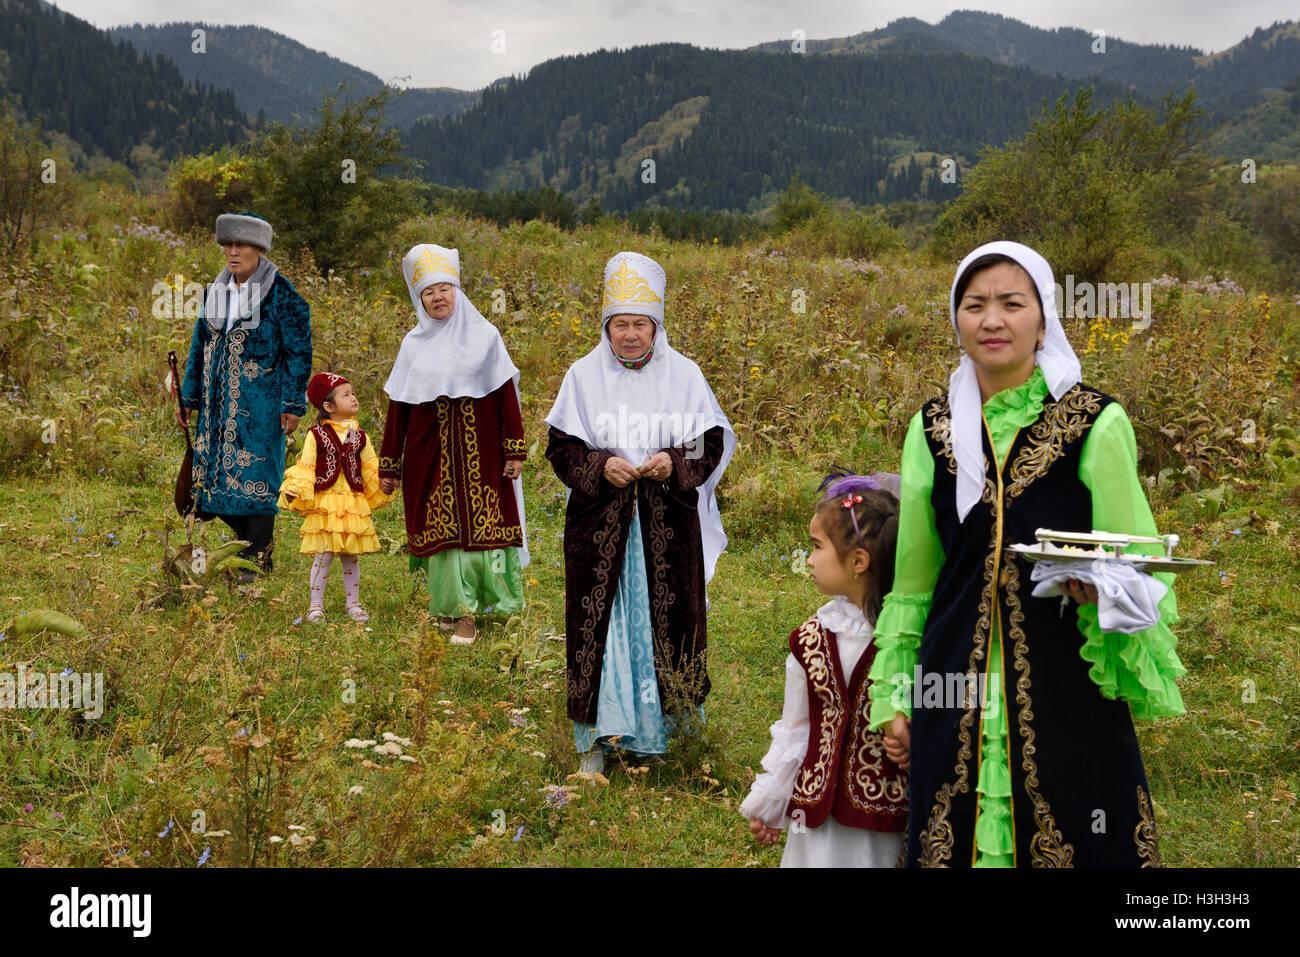 Kazakh family in field after Tusau Kesu ceremony at Huns Village near Almaty Kazakhstan - Stock Image